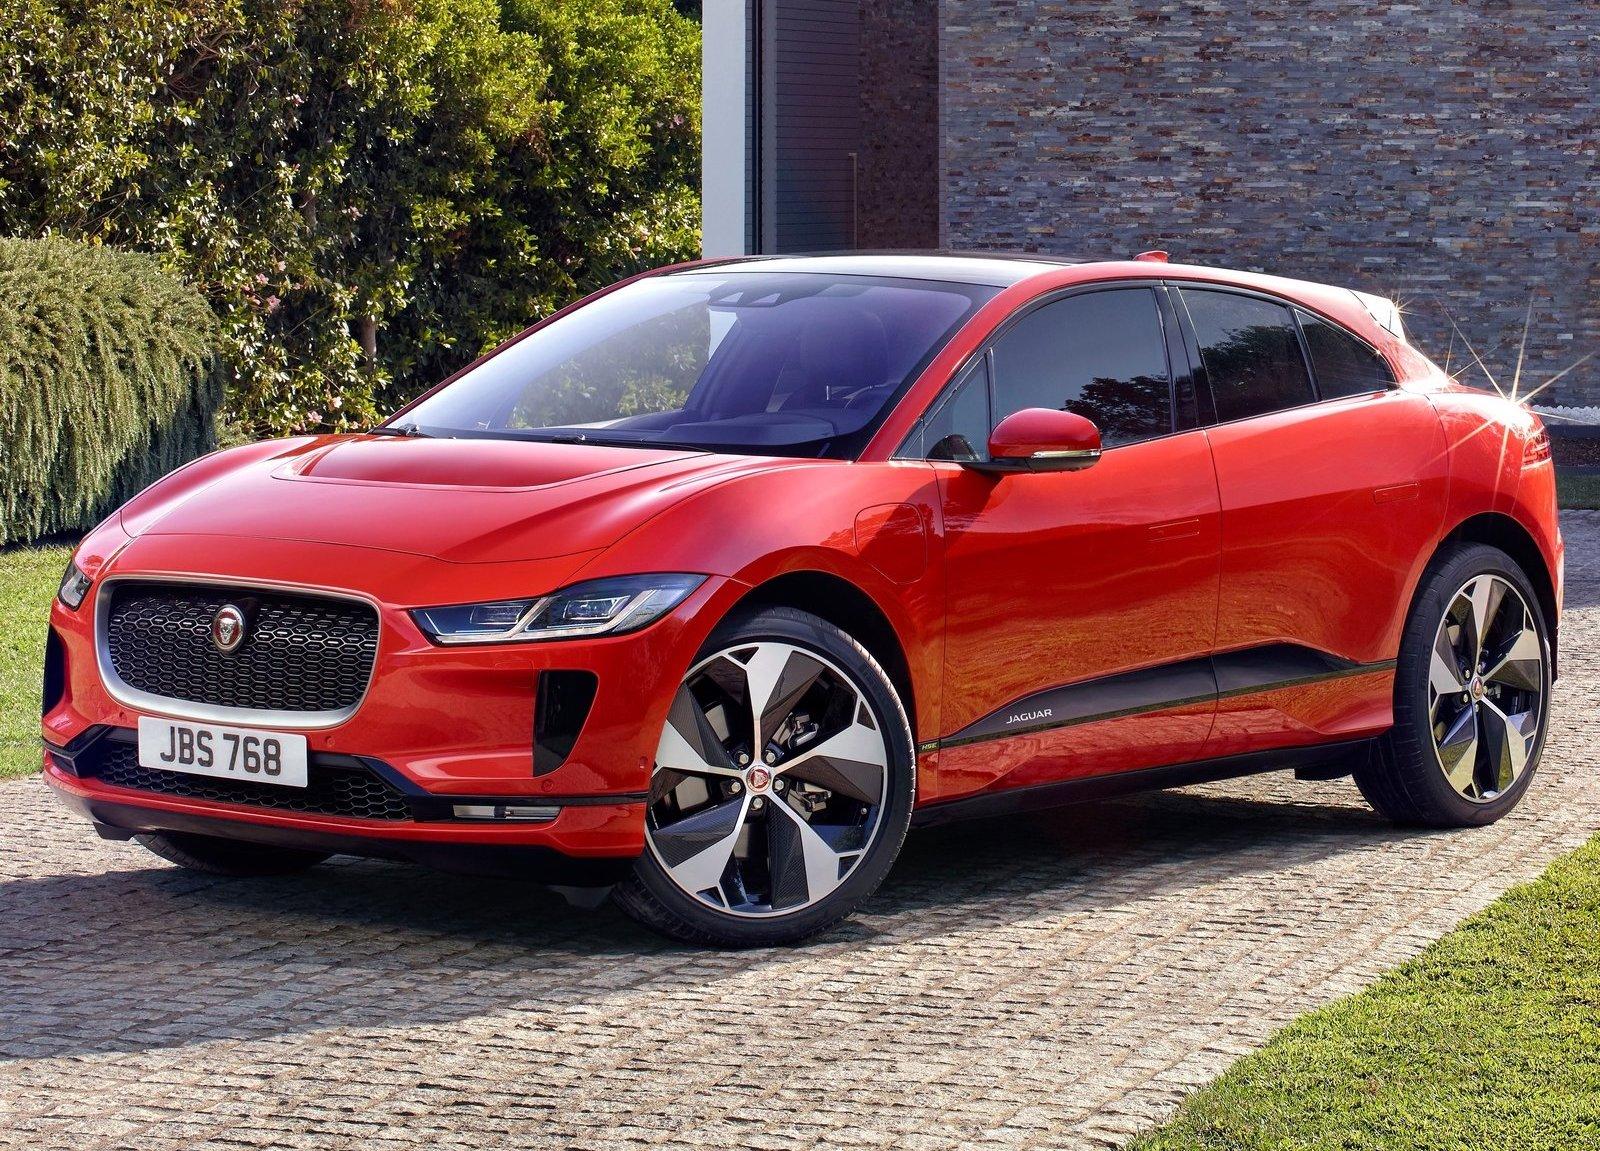 2019 Jaguar I-Pace red